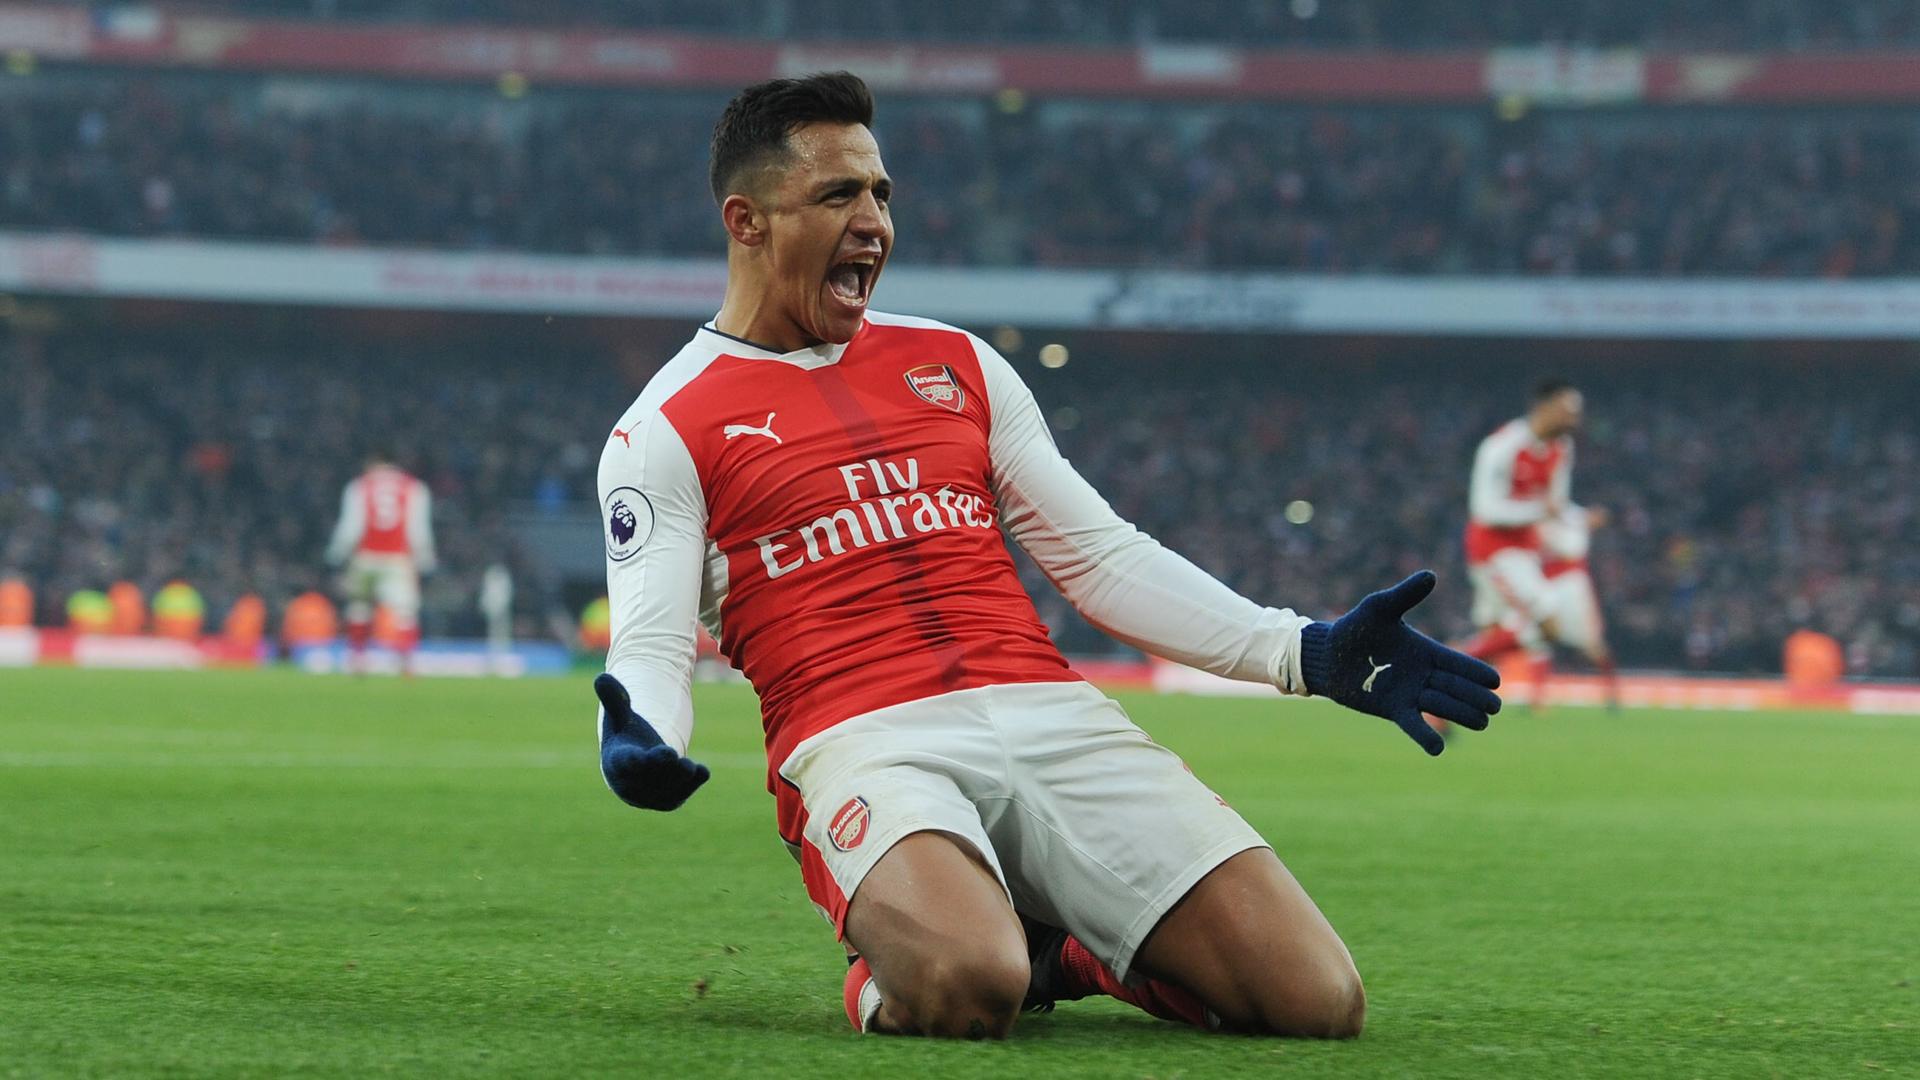 19 may 2021 20:15 location: Alexis Sánchez Wallpaper at Arsenal FC | PixelsTalk.Net